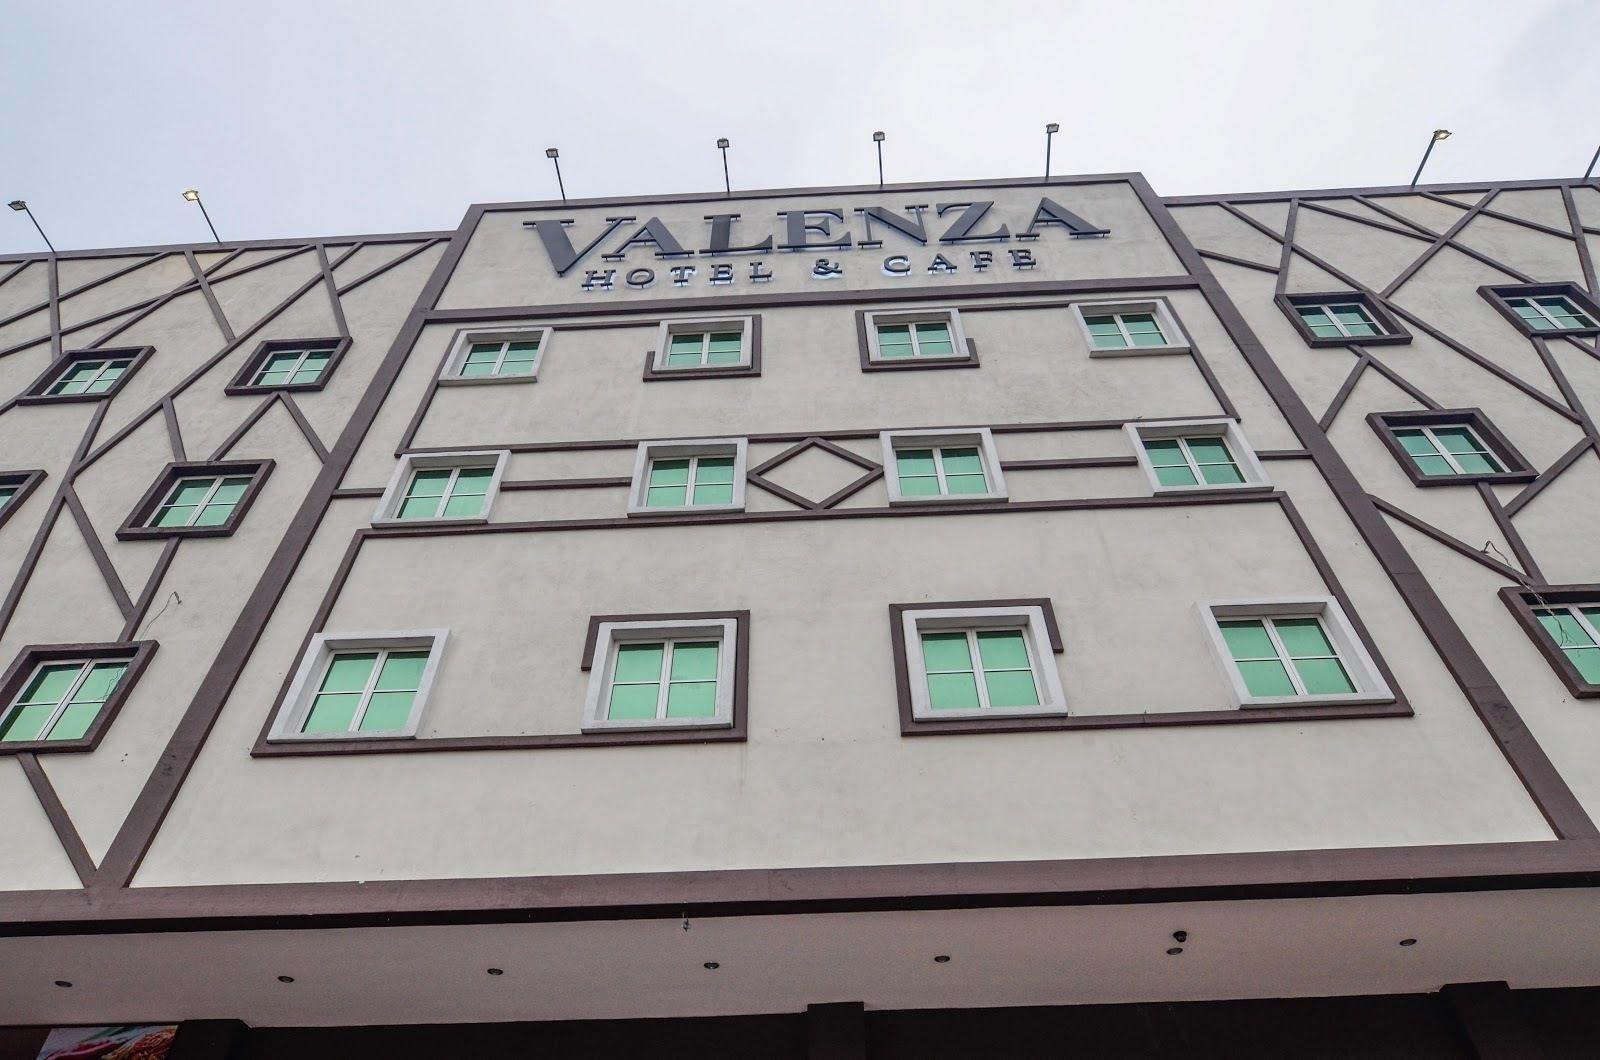 Valenza Hotel & Cafe, Kuala Lumpur